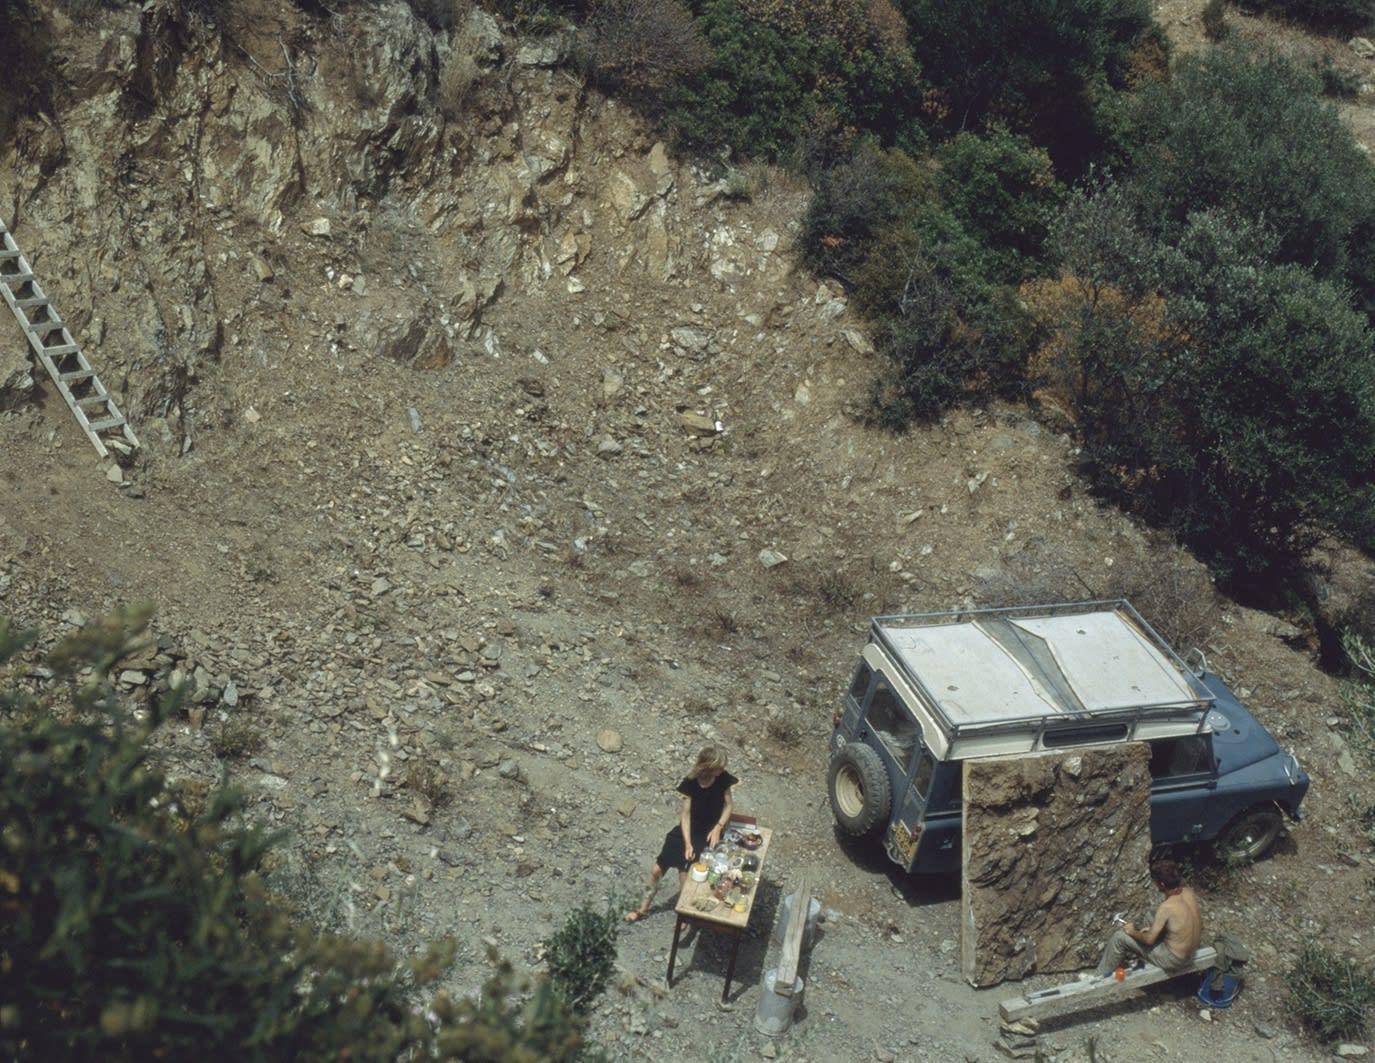 Joan Hills and Mark Boyle, Sardinia (World Series site), 1978.